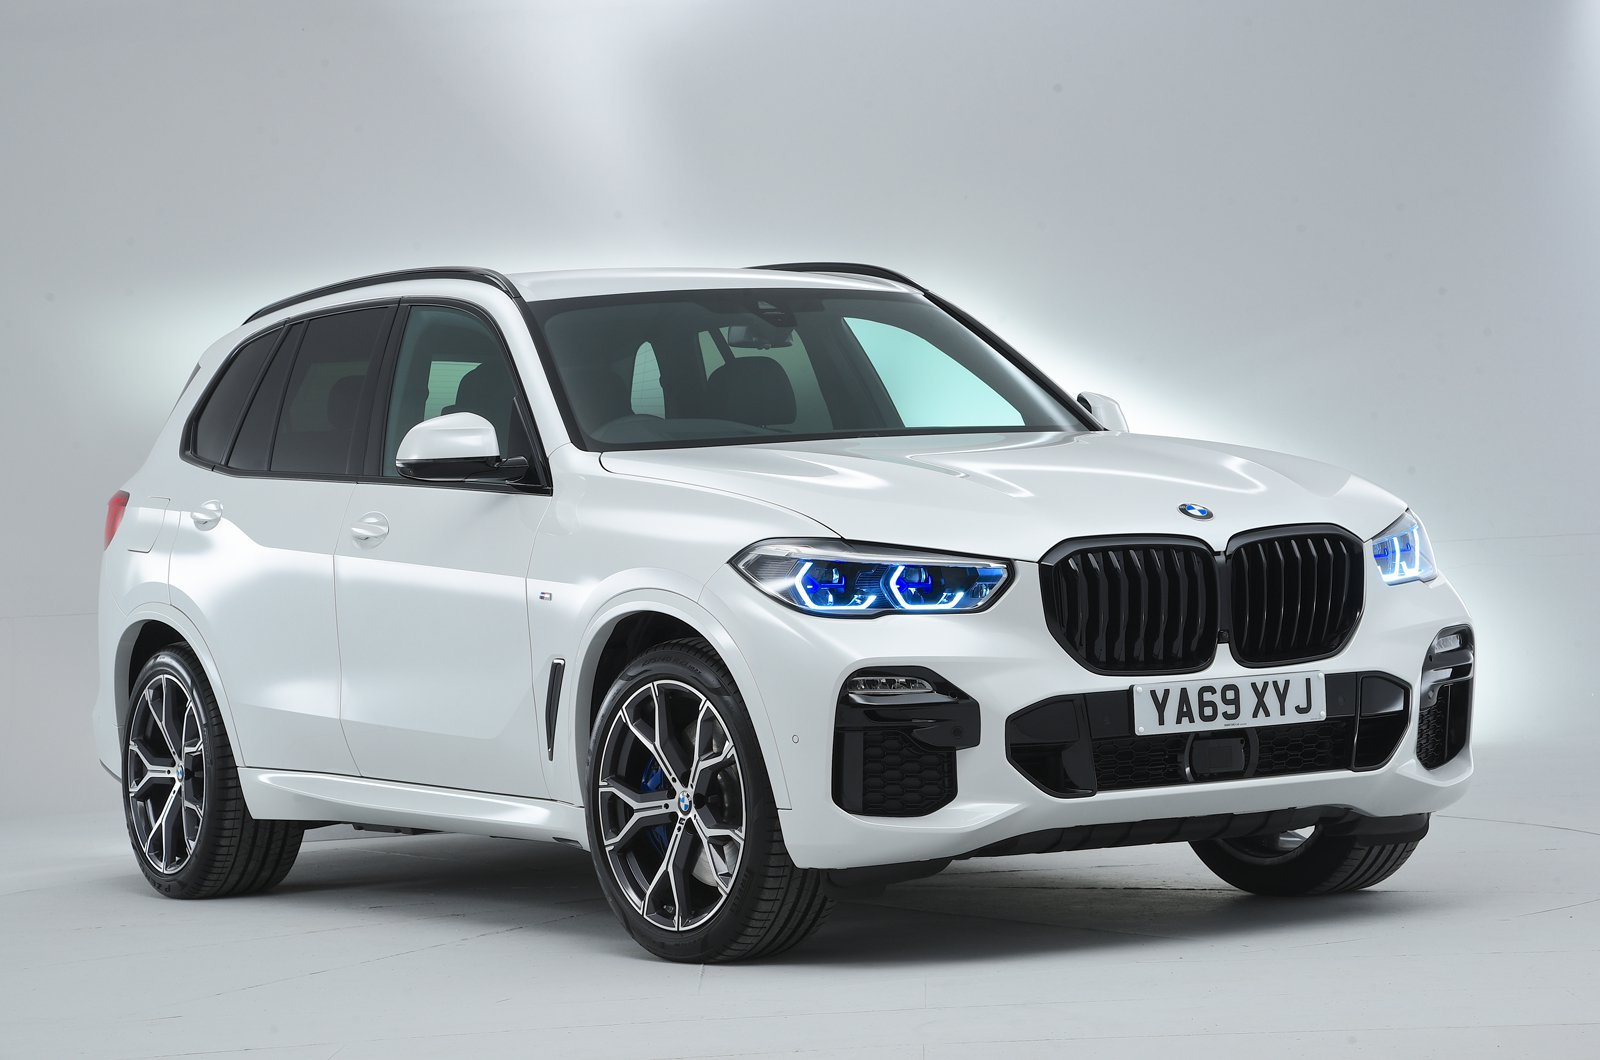 BMW X5 45e front studio - 69-plate car